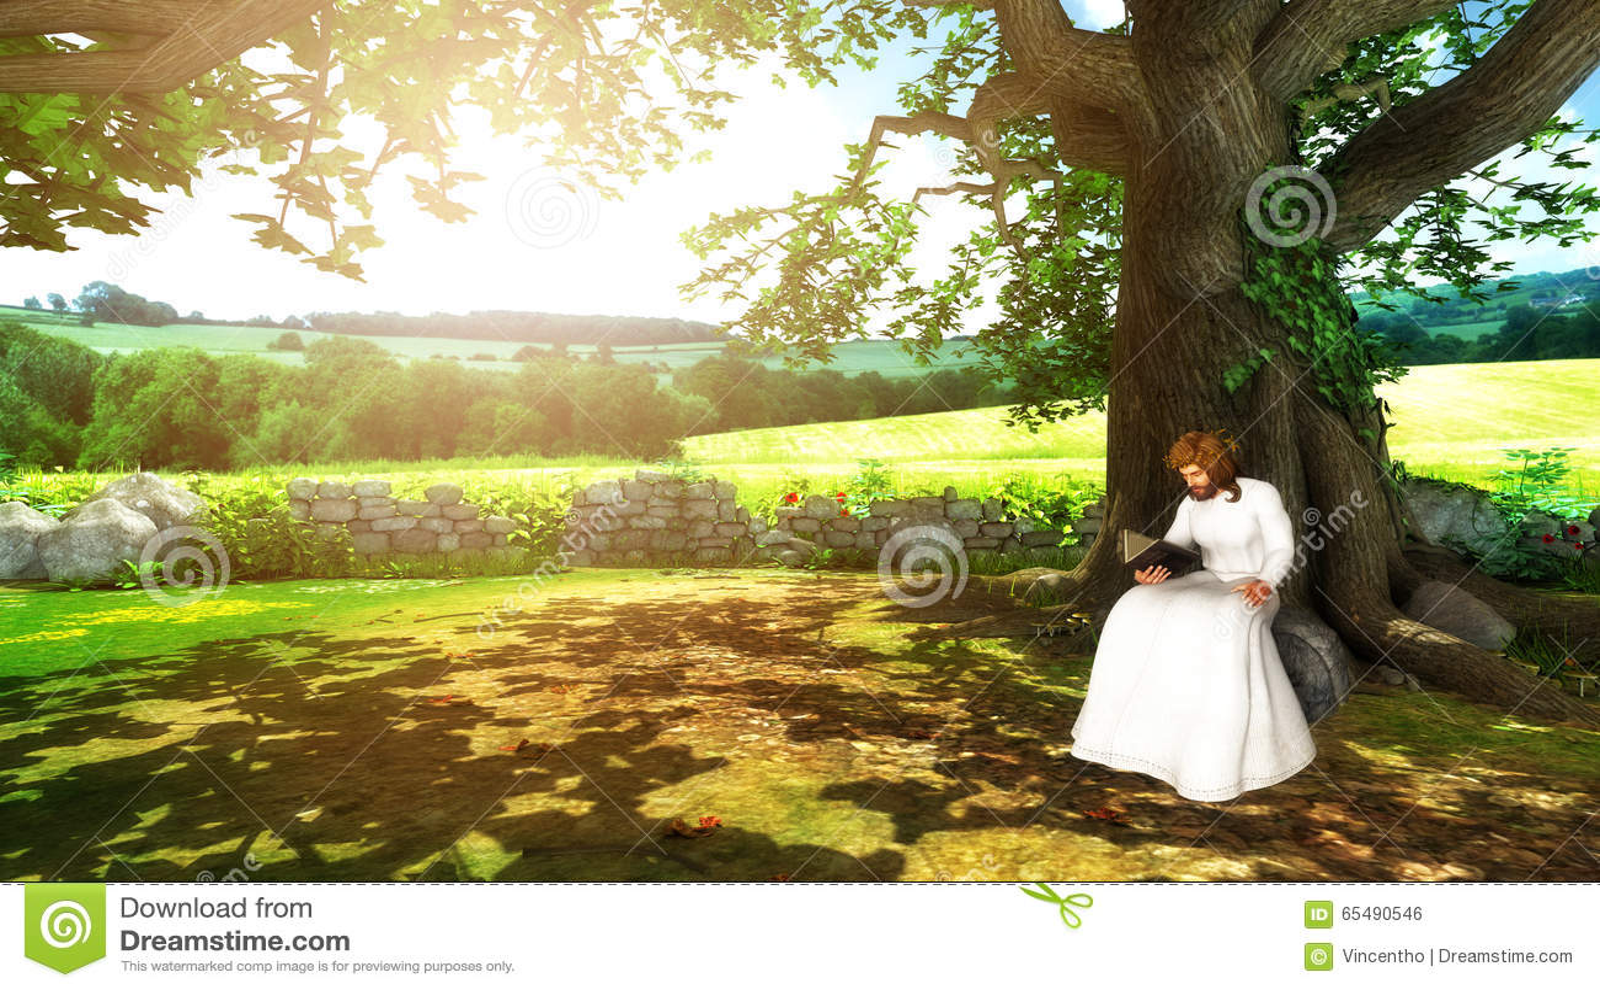 Jesus Christ Reading Bible Under A Tree Illustration Stock